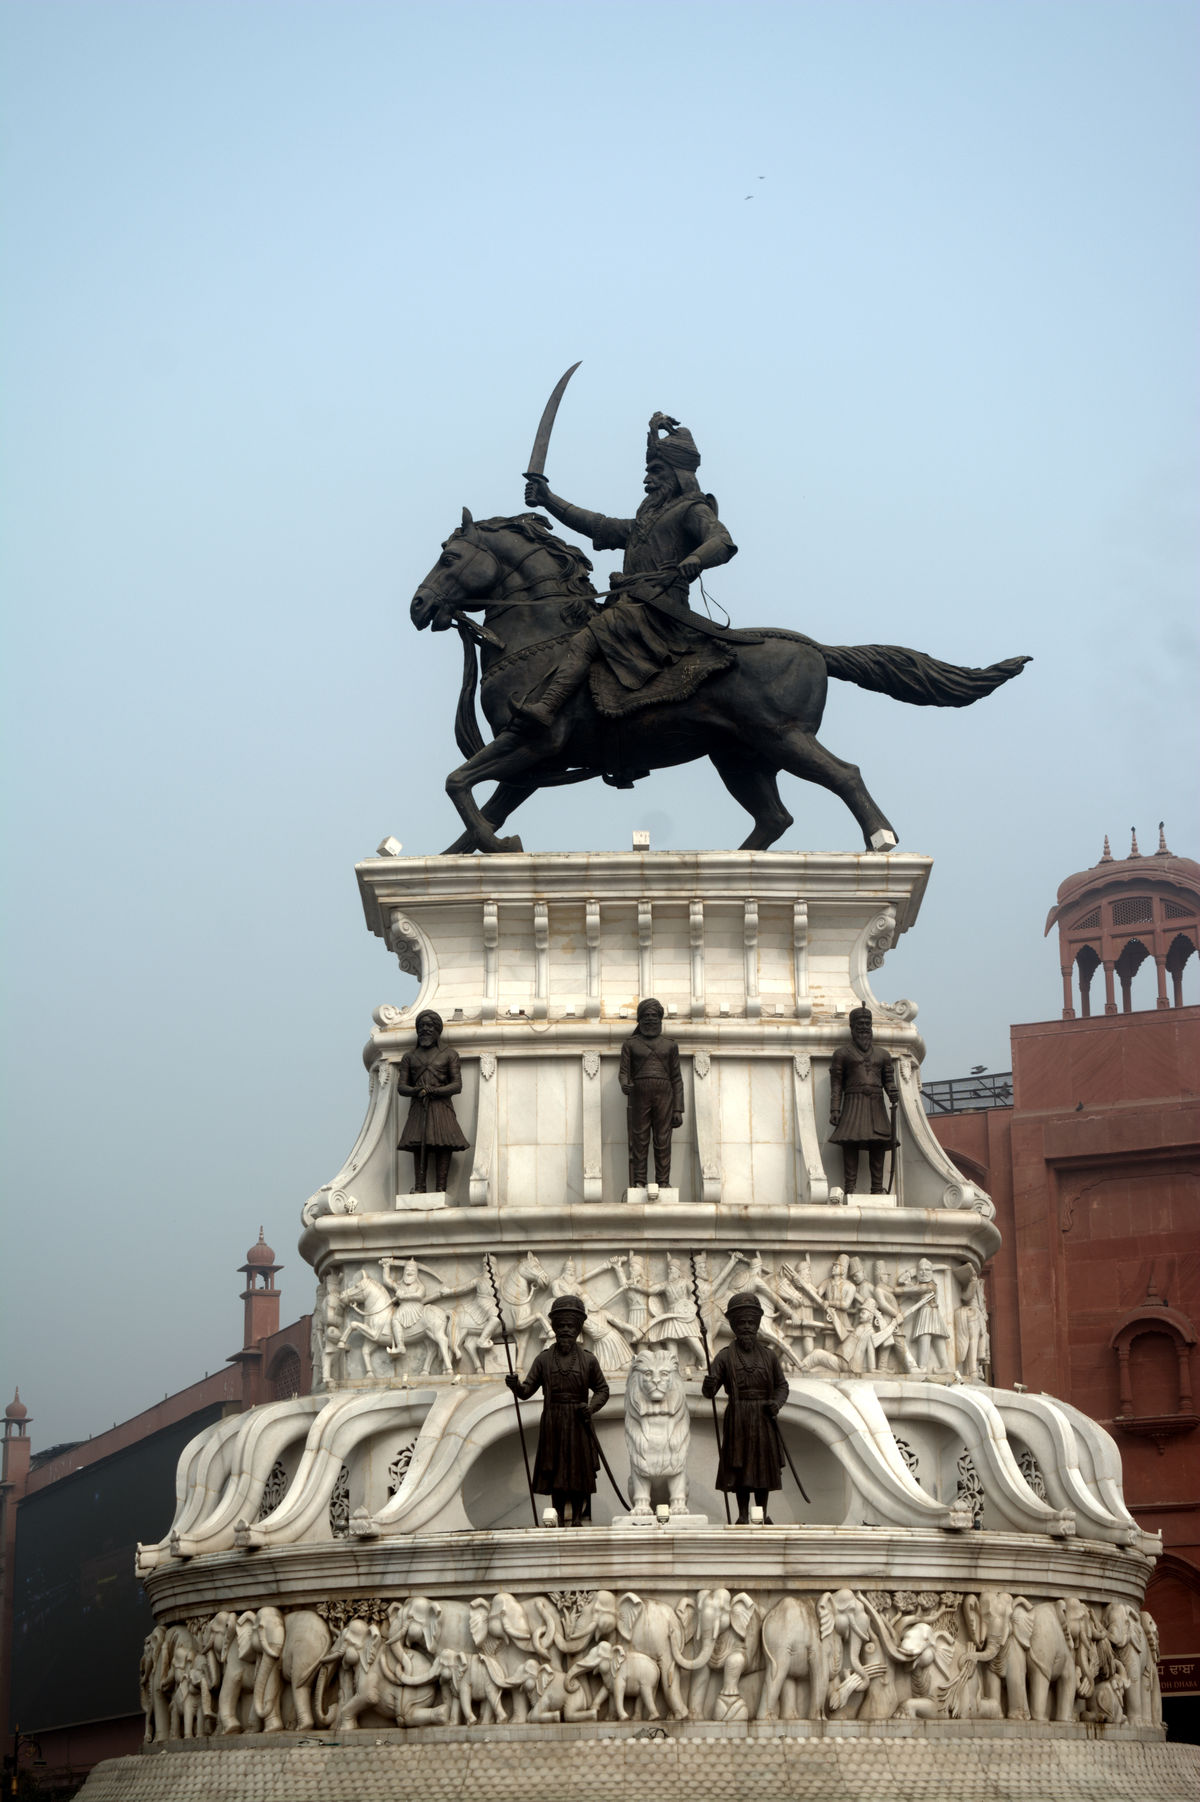 Architecture Art And Craft Creativity History Horse Human Representation Ranjit Singh Sculpture Statue Travel Destinations